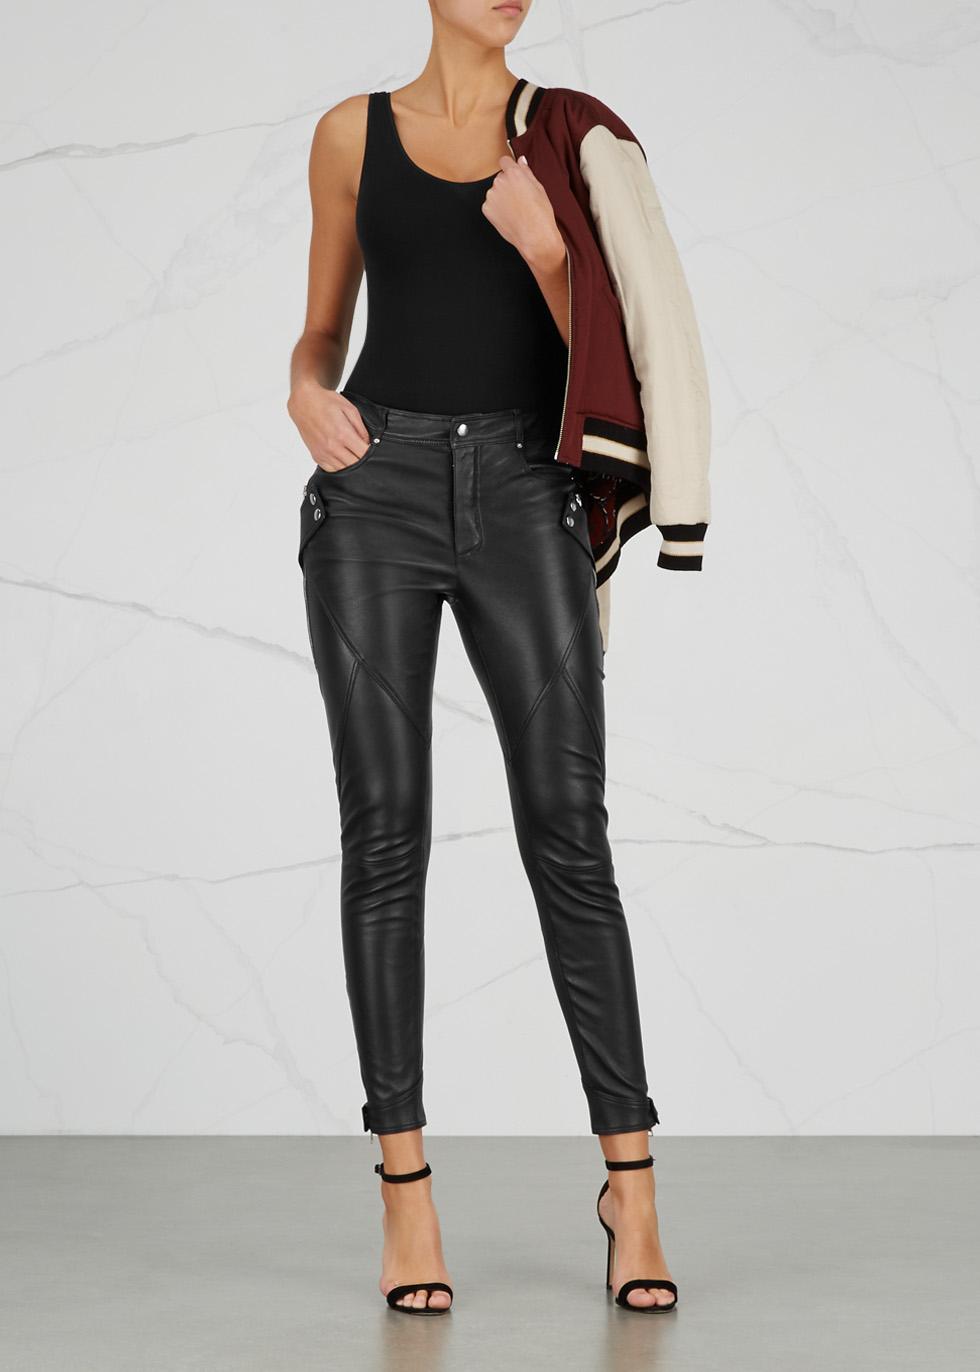 Black seamless jersey bodysuit - Wolford